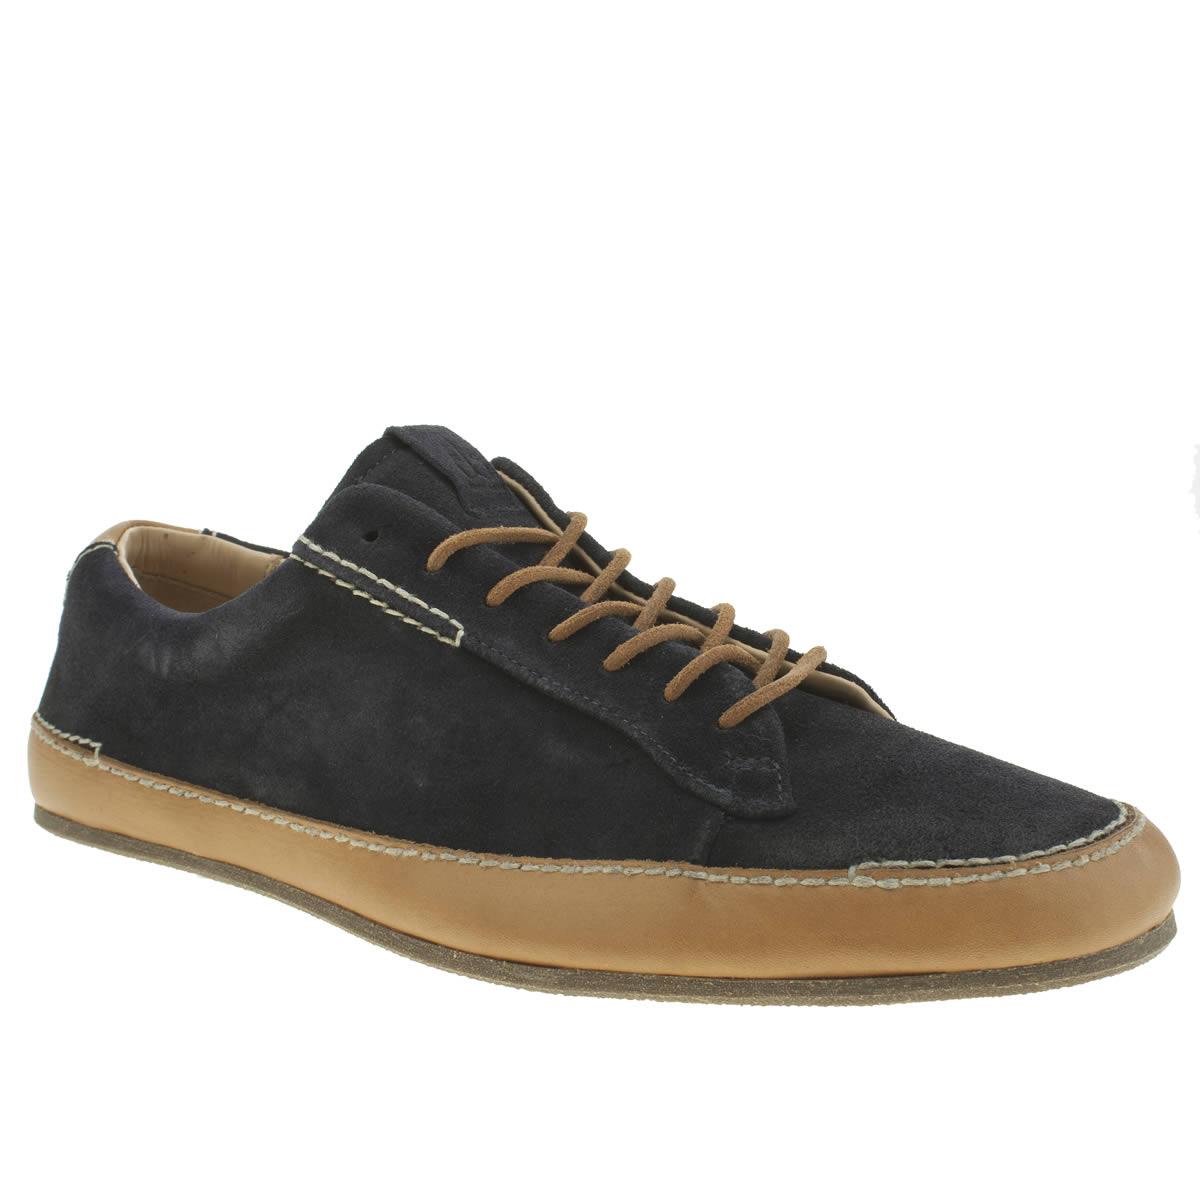 Northern Cobbler Northern Cobbler Navy Brill Mens Shoes